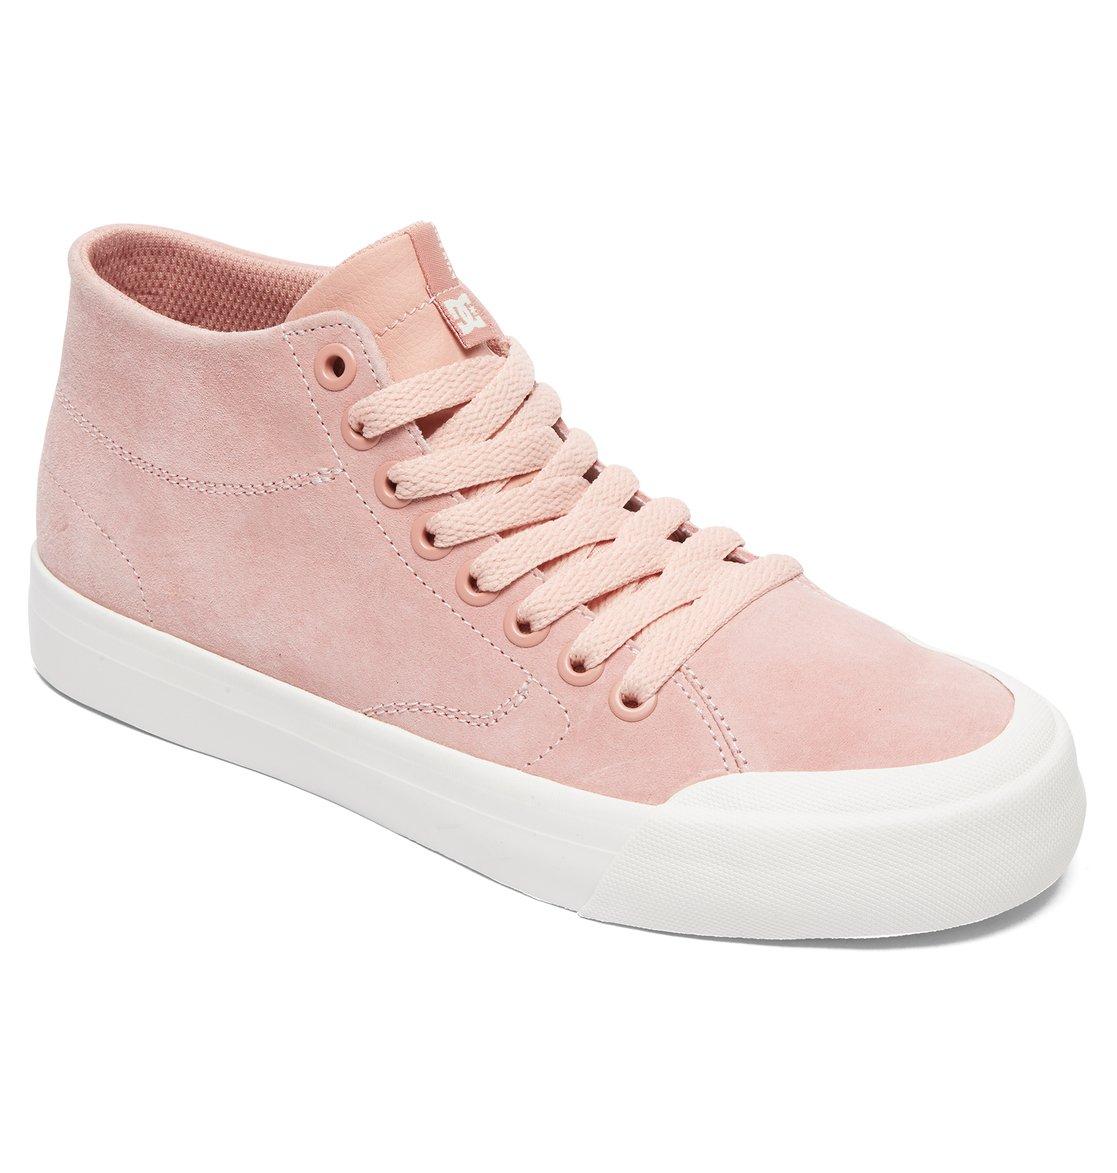 Evan Hi - Chaussures montantes en cuir - Blanc - DC Shoes 9n5l5dhyjY